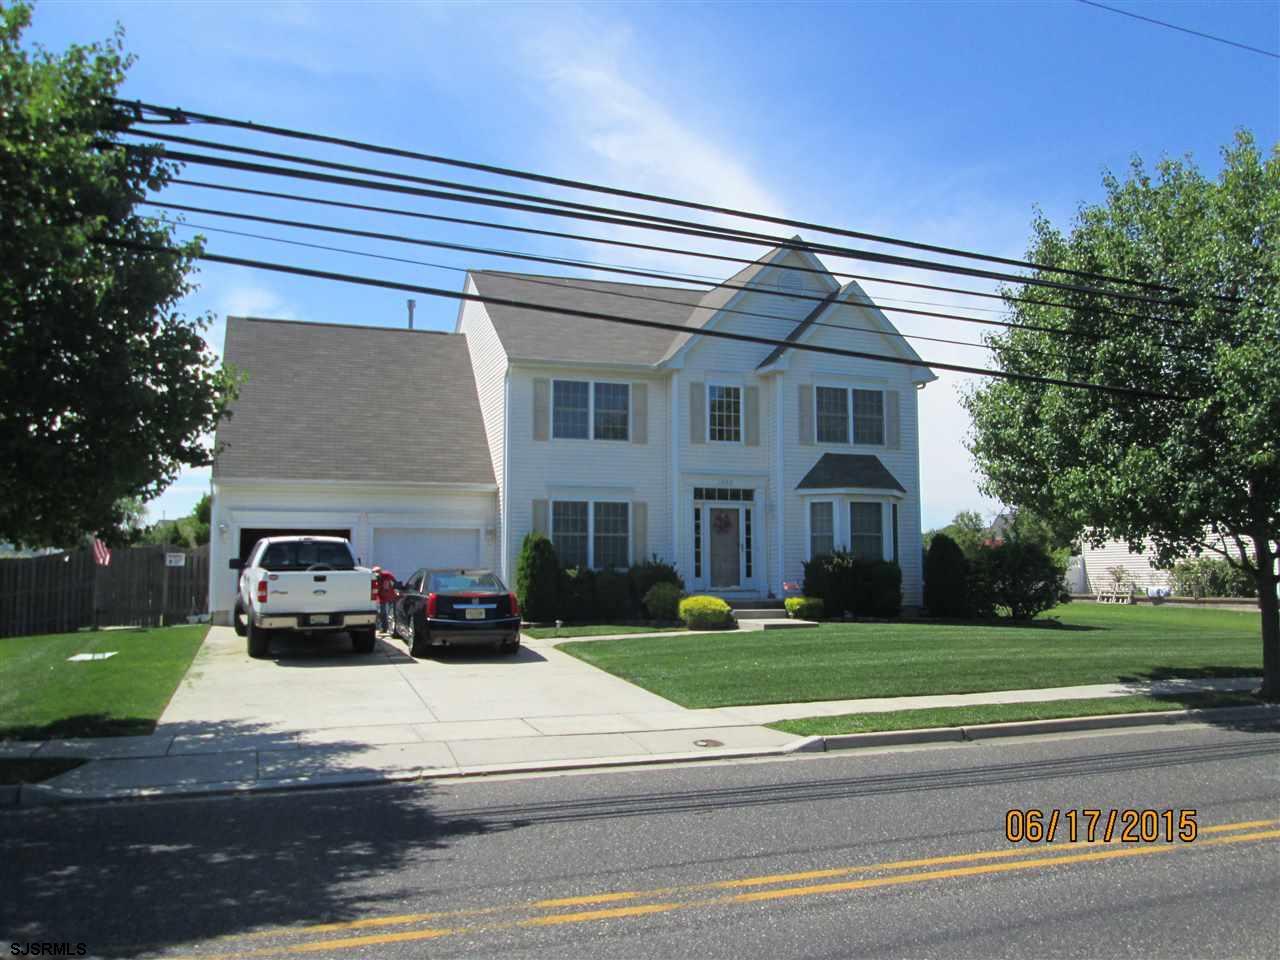 1055 Old Zion Road, Egg Harbor Township, NJ 08234